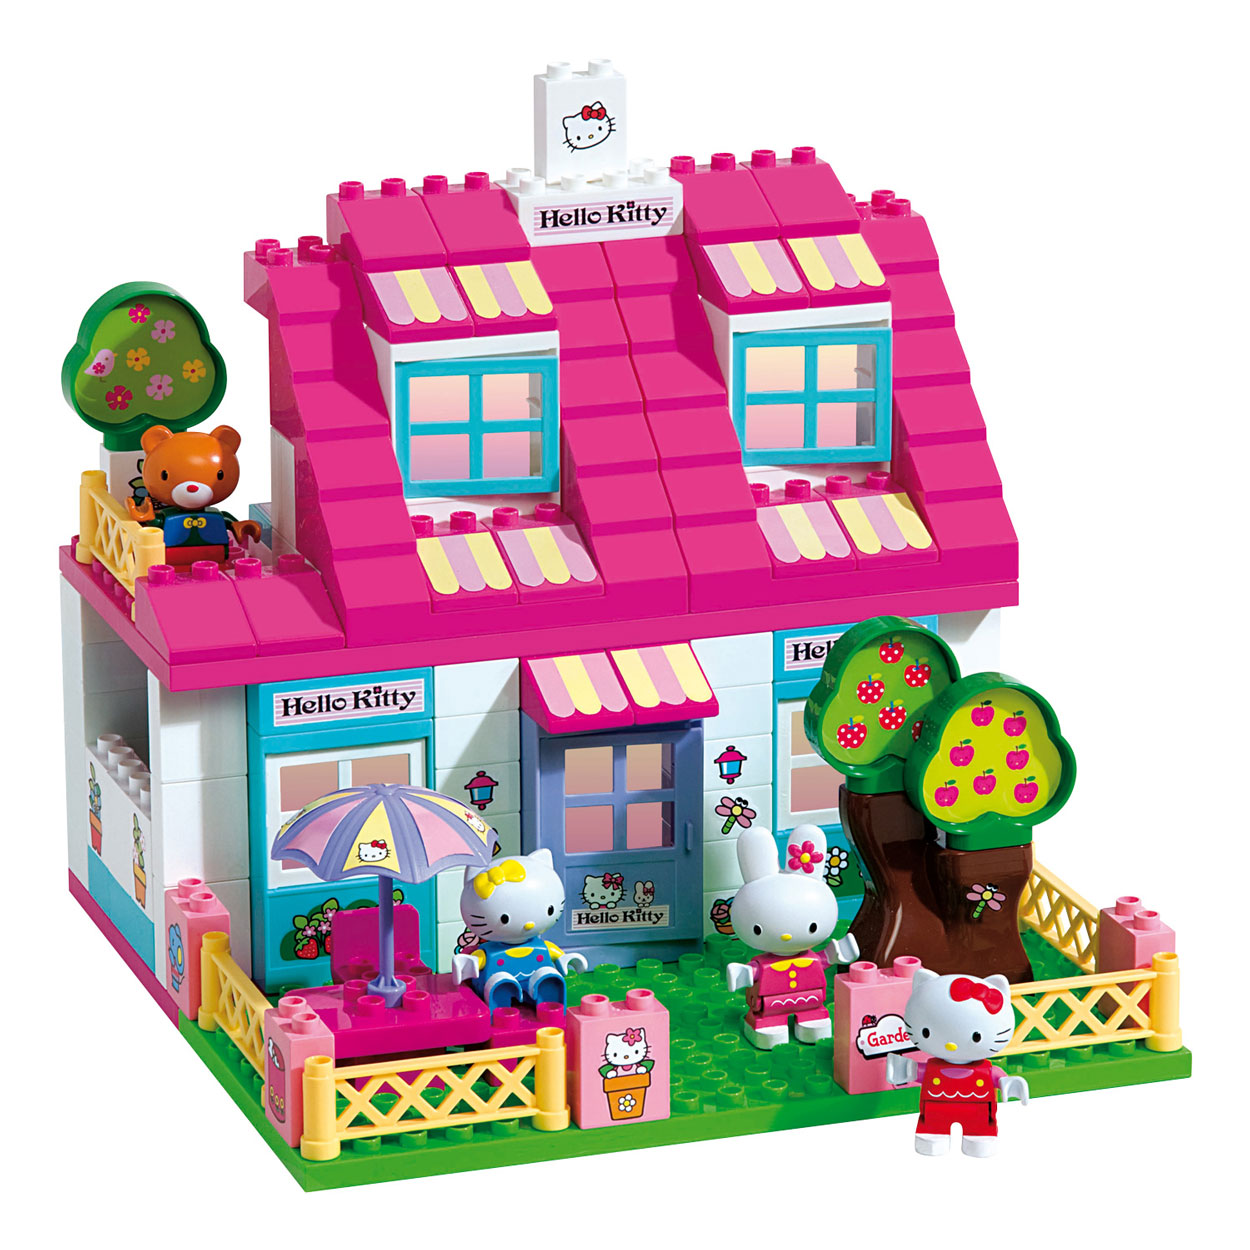 Hello kitty unico huis online kopen - La maison de hello kitty ...